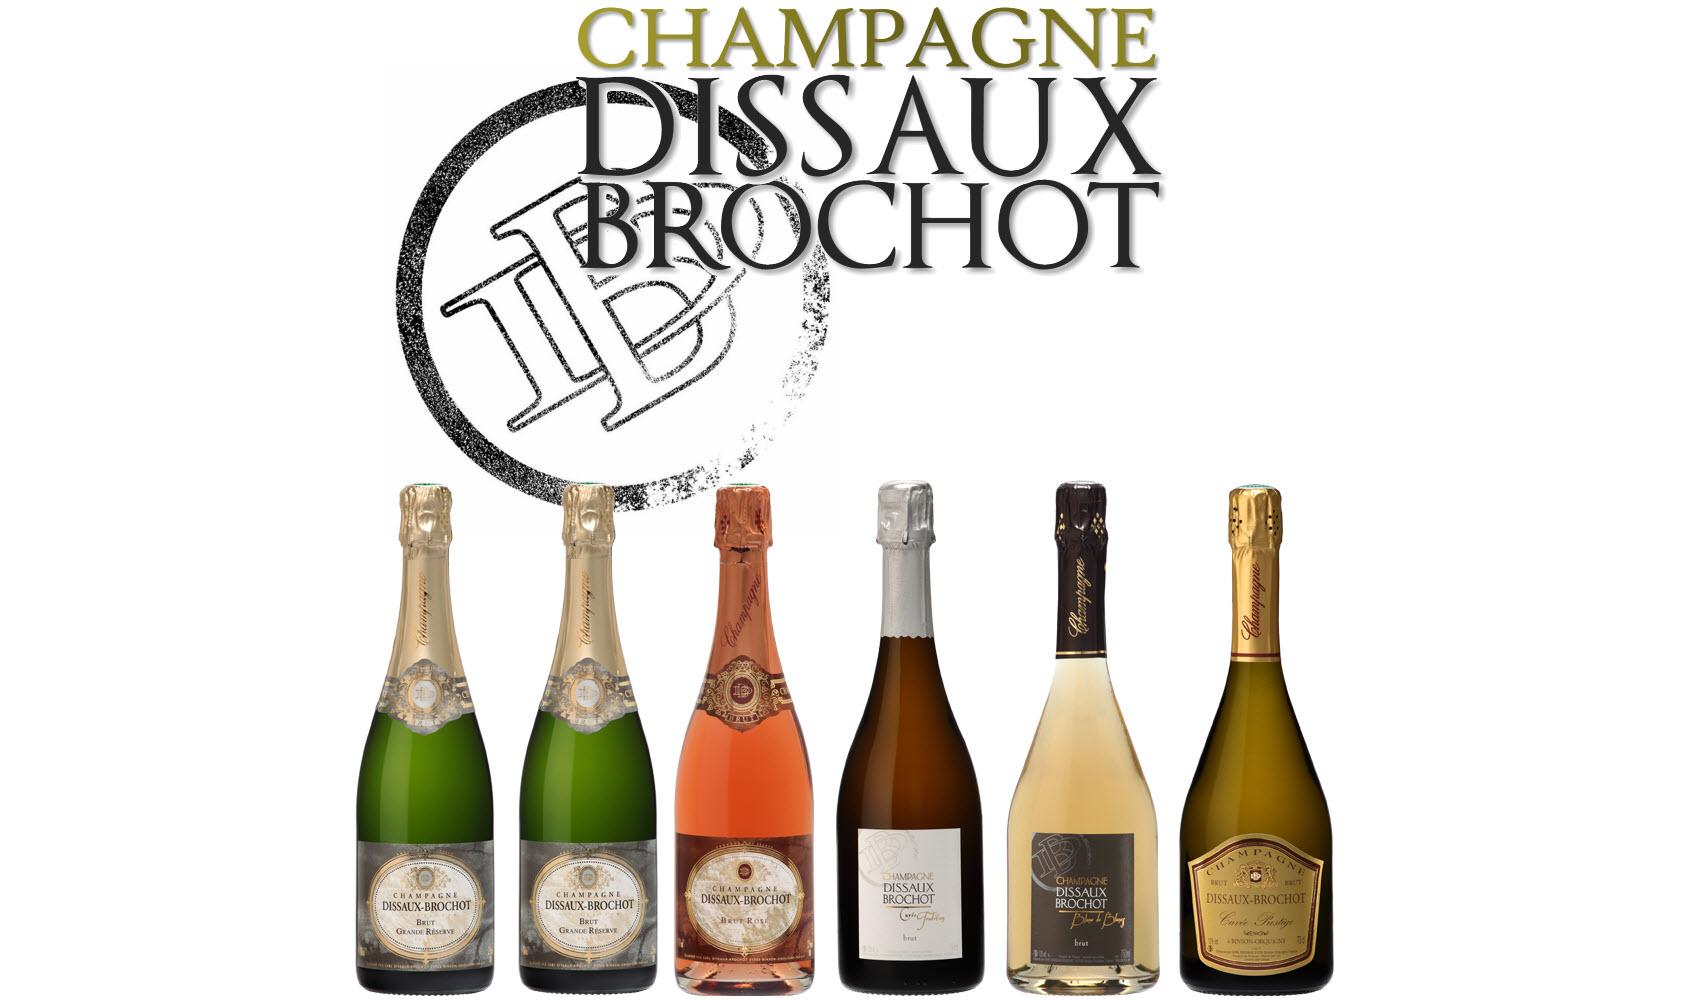 Champagne Dissaux Brochot